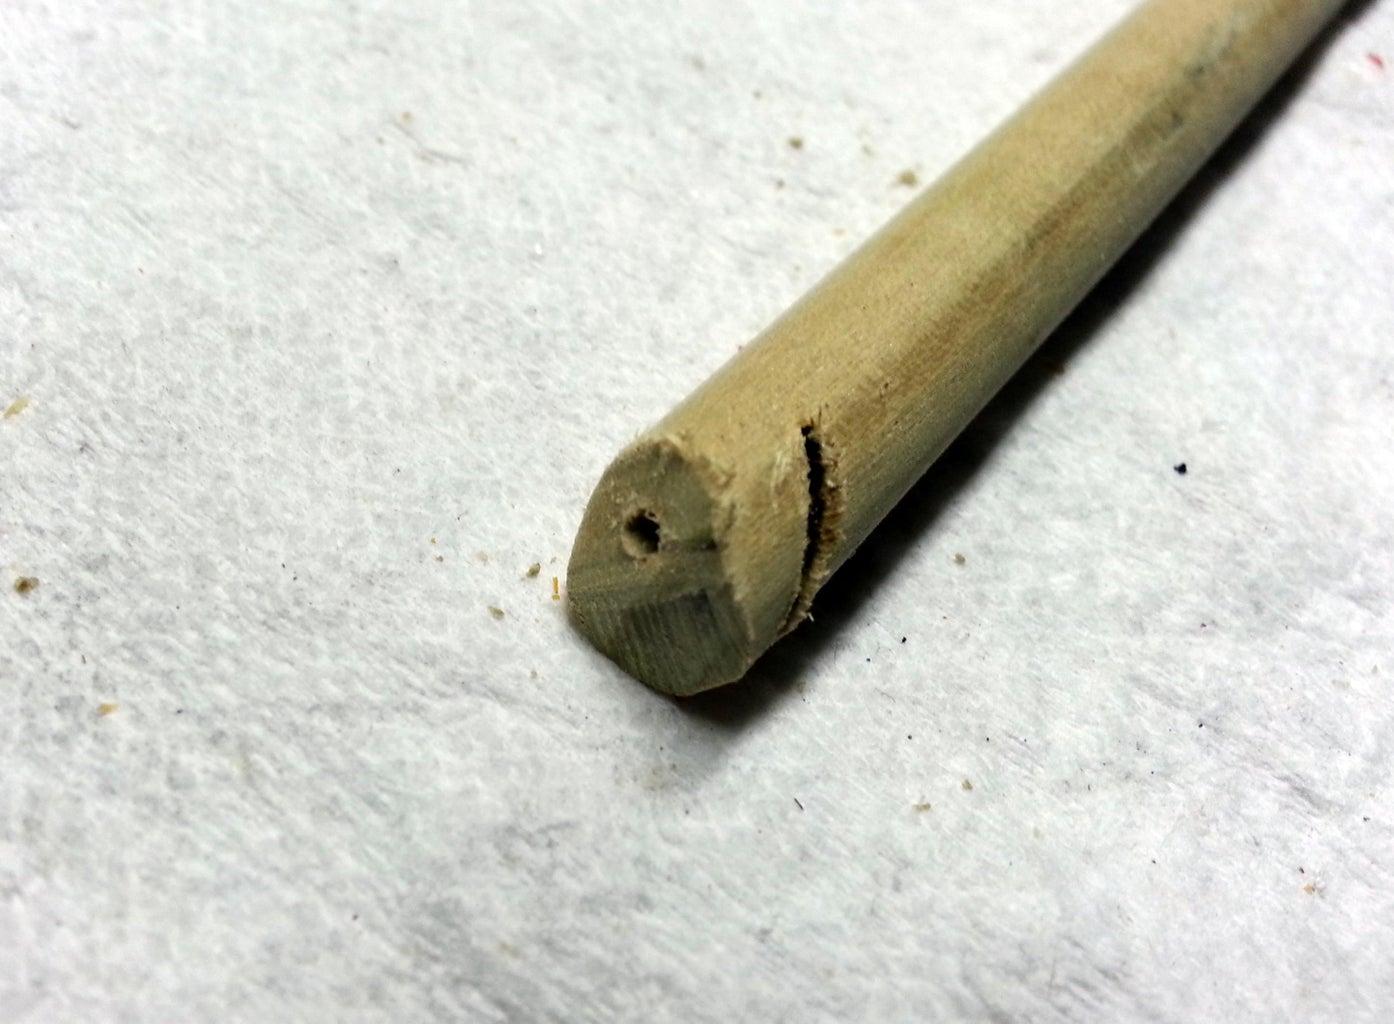 Drill Pilot Hole for Machine Screw